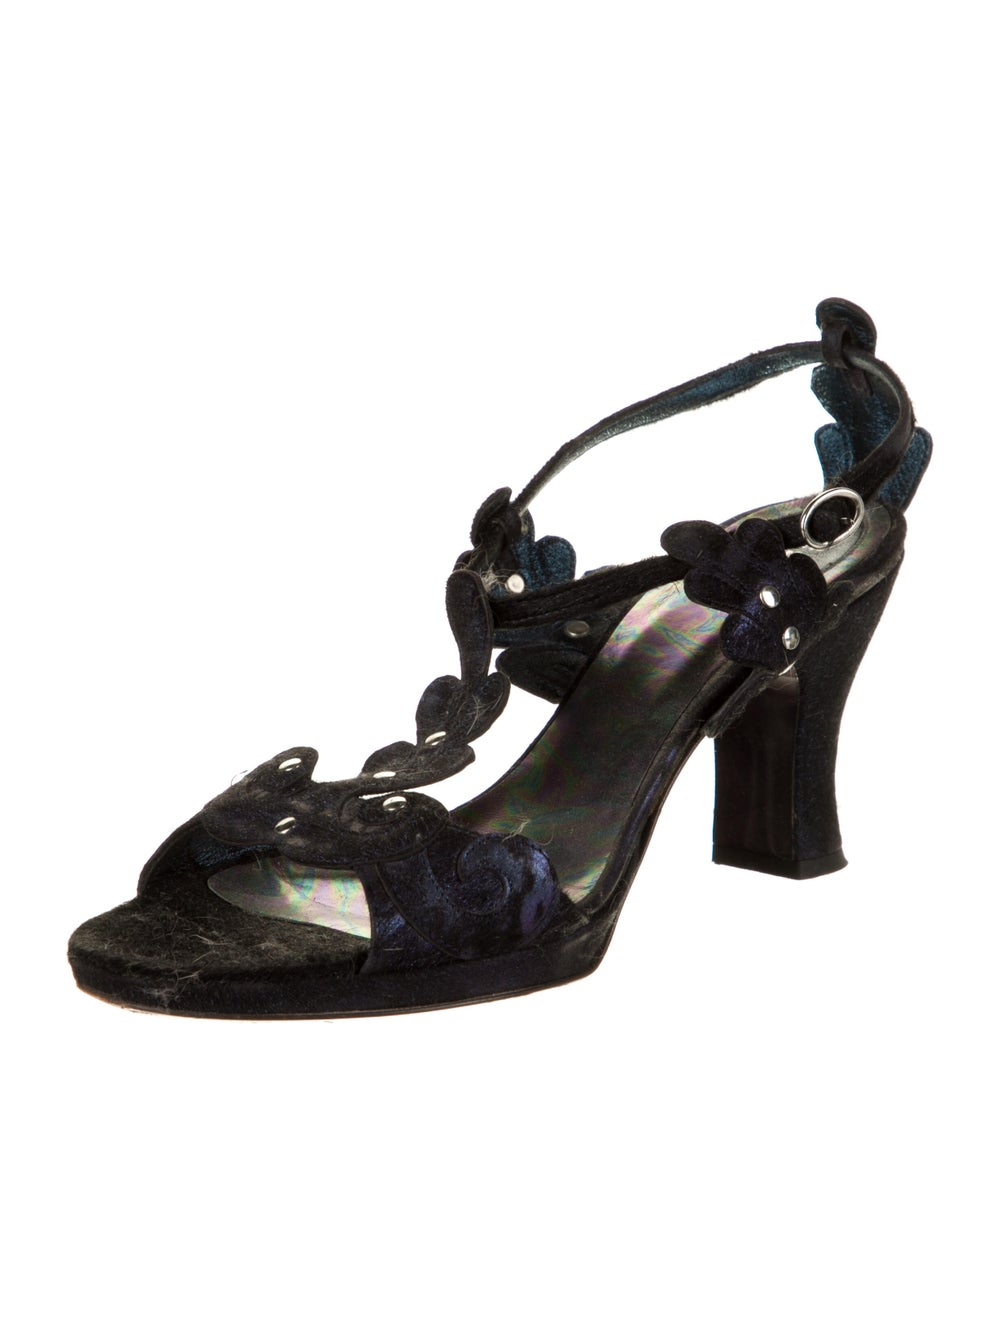 Anna Sui Sandals Black - image 2